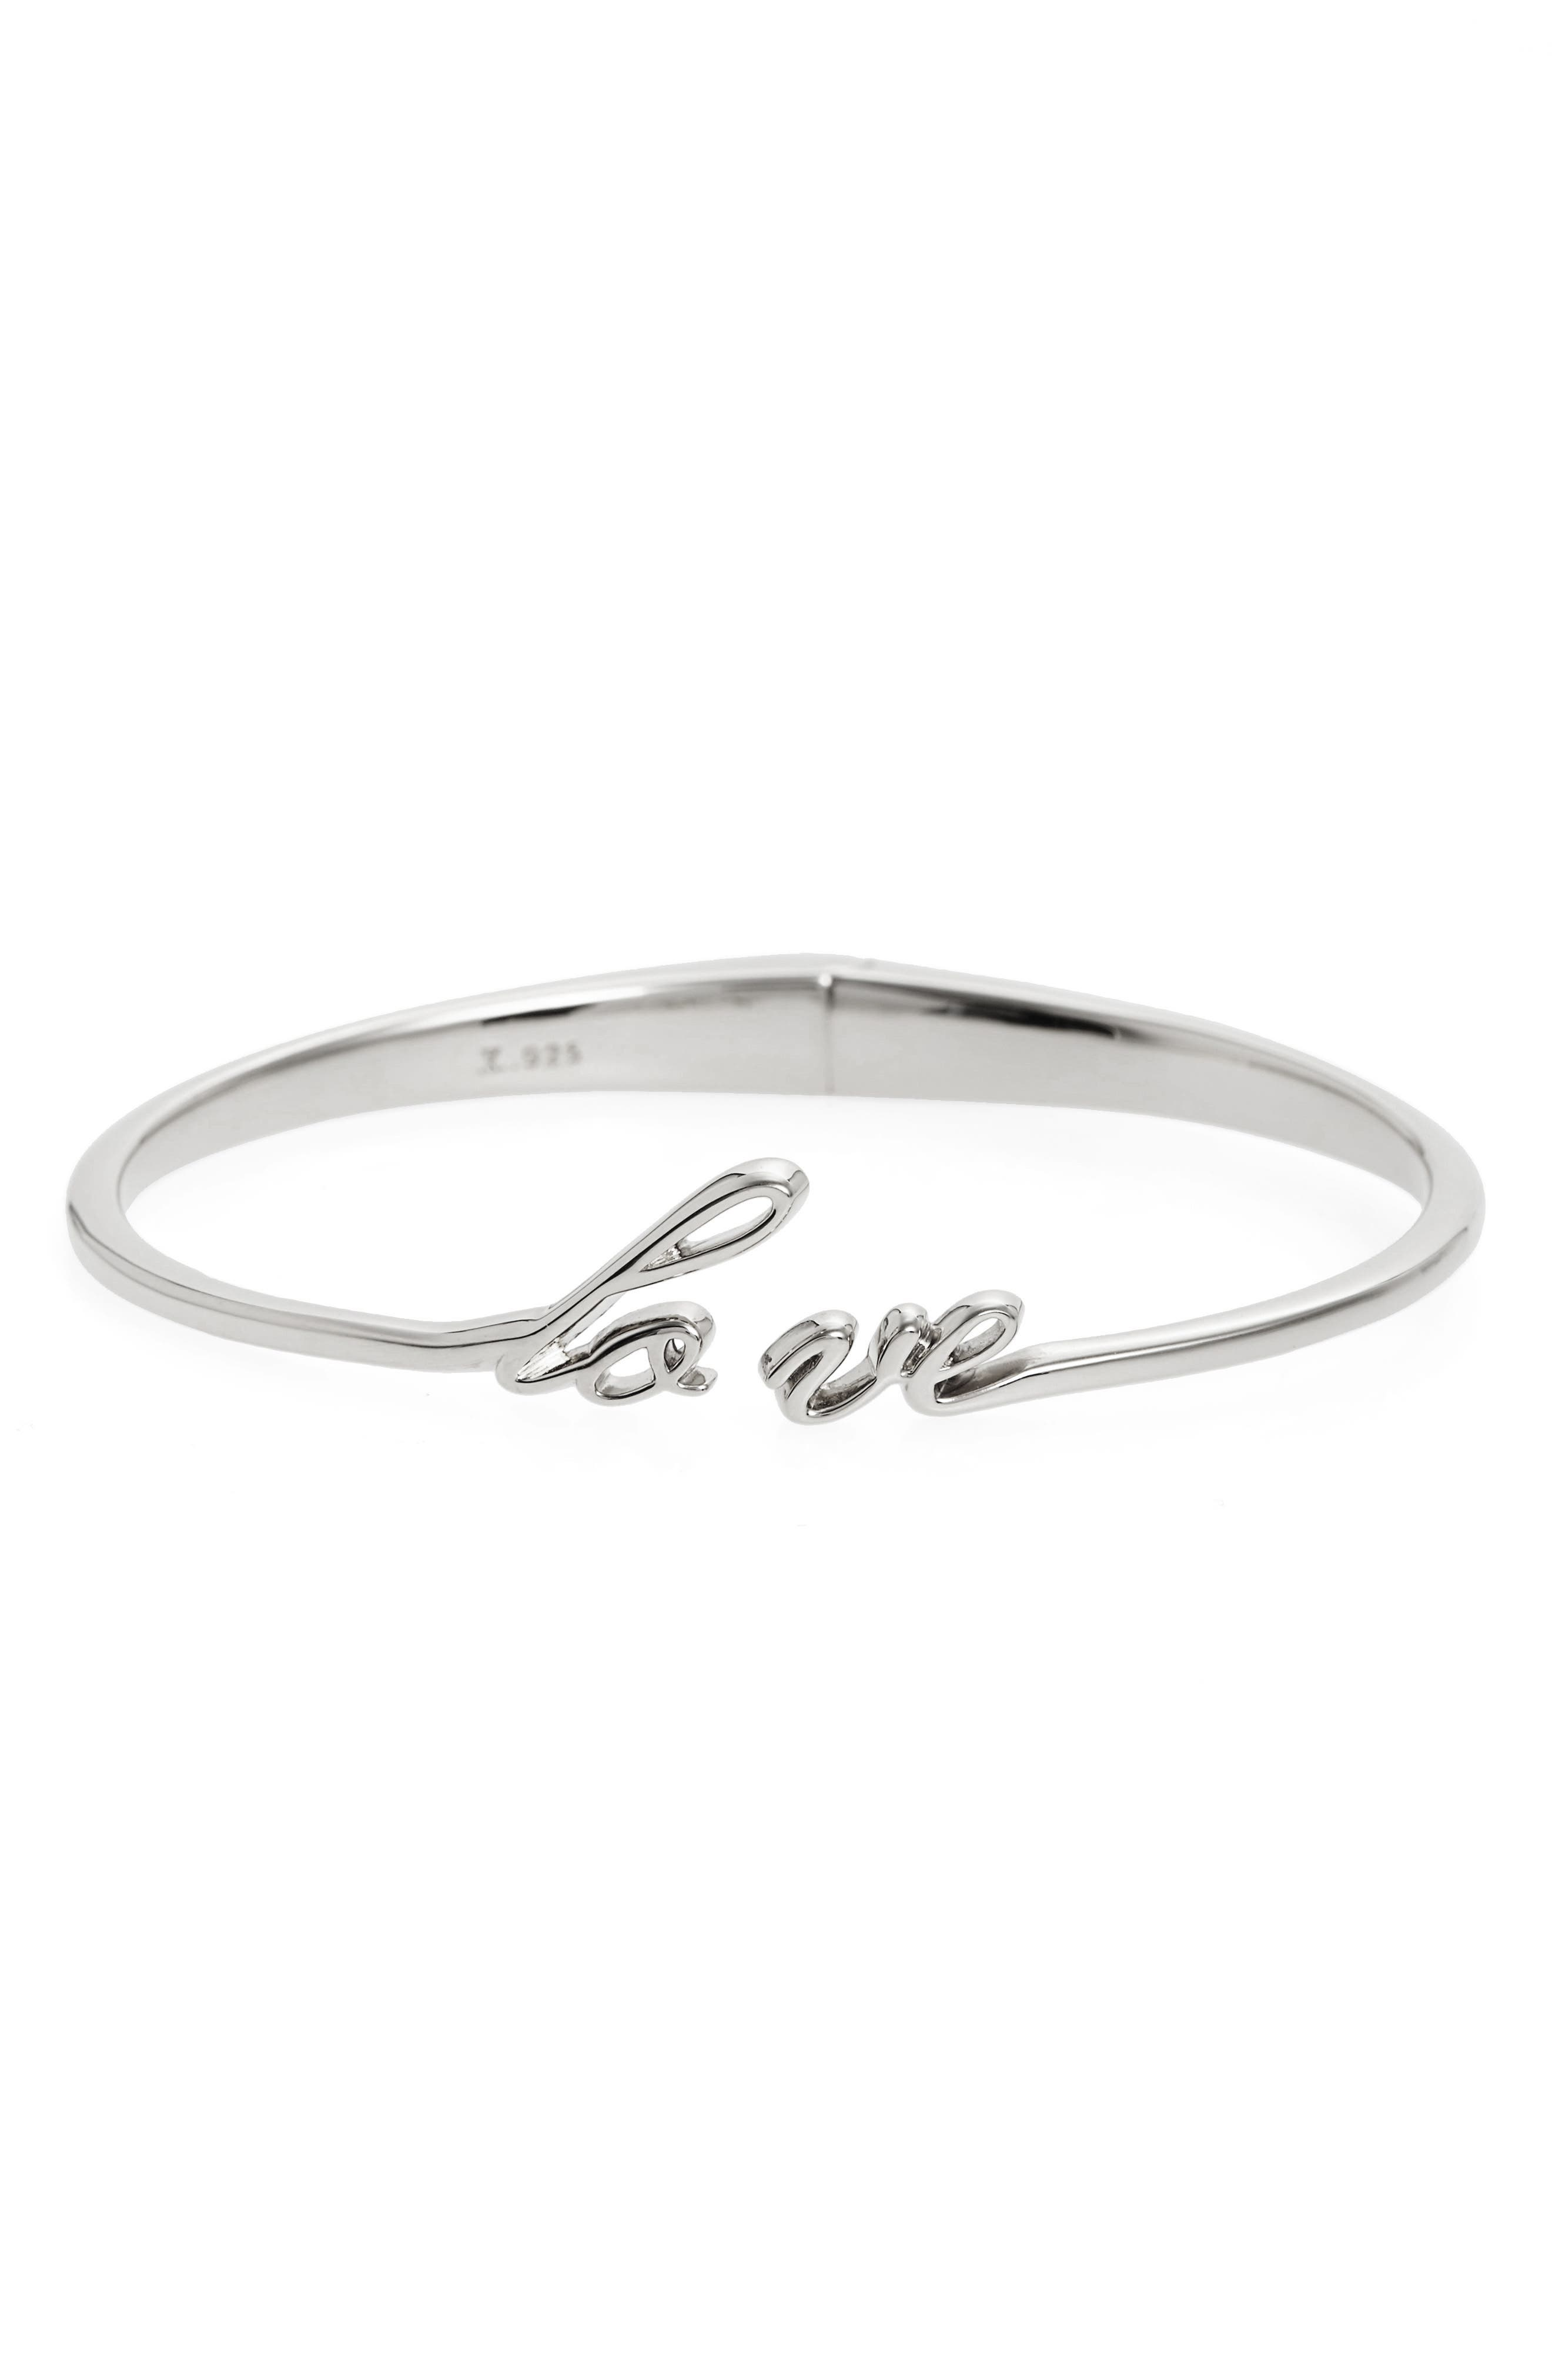 Judith Jack To Love by Love Hinge Bracelet